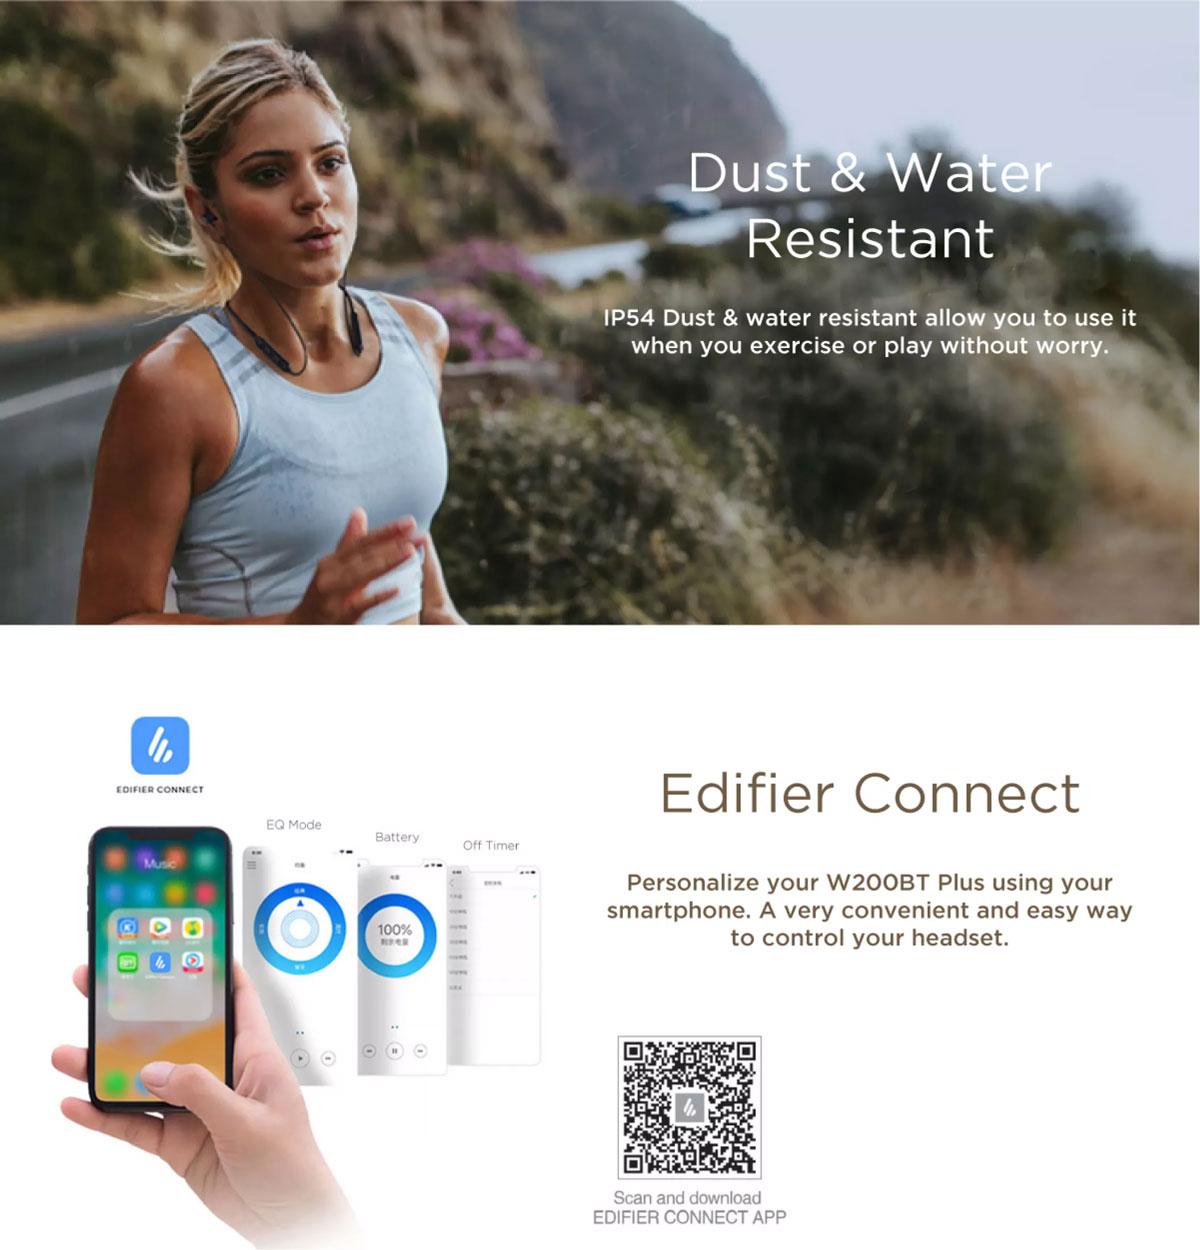 Edifier W200BT Plus Bluetooth